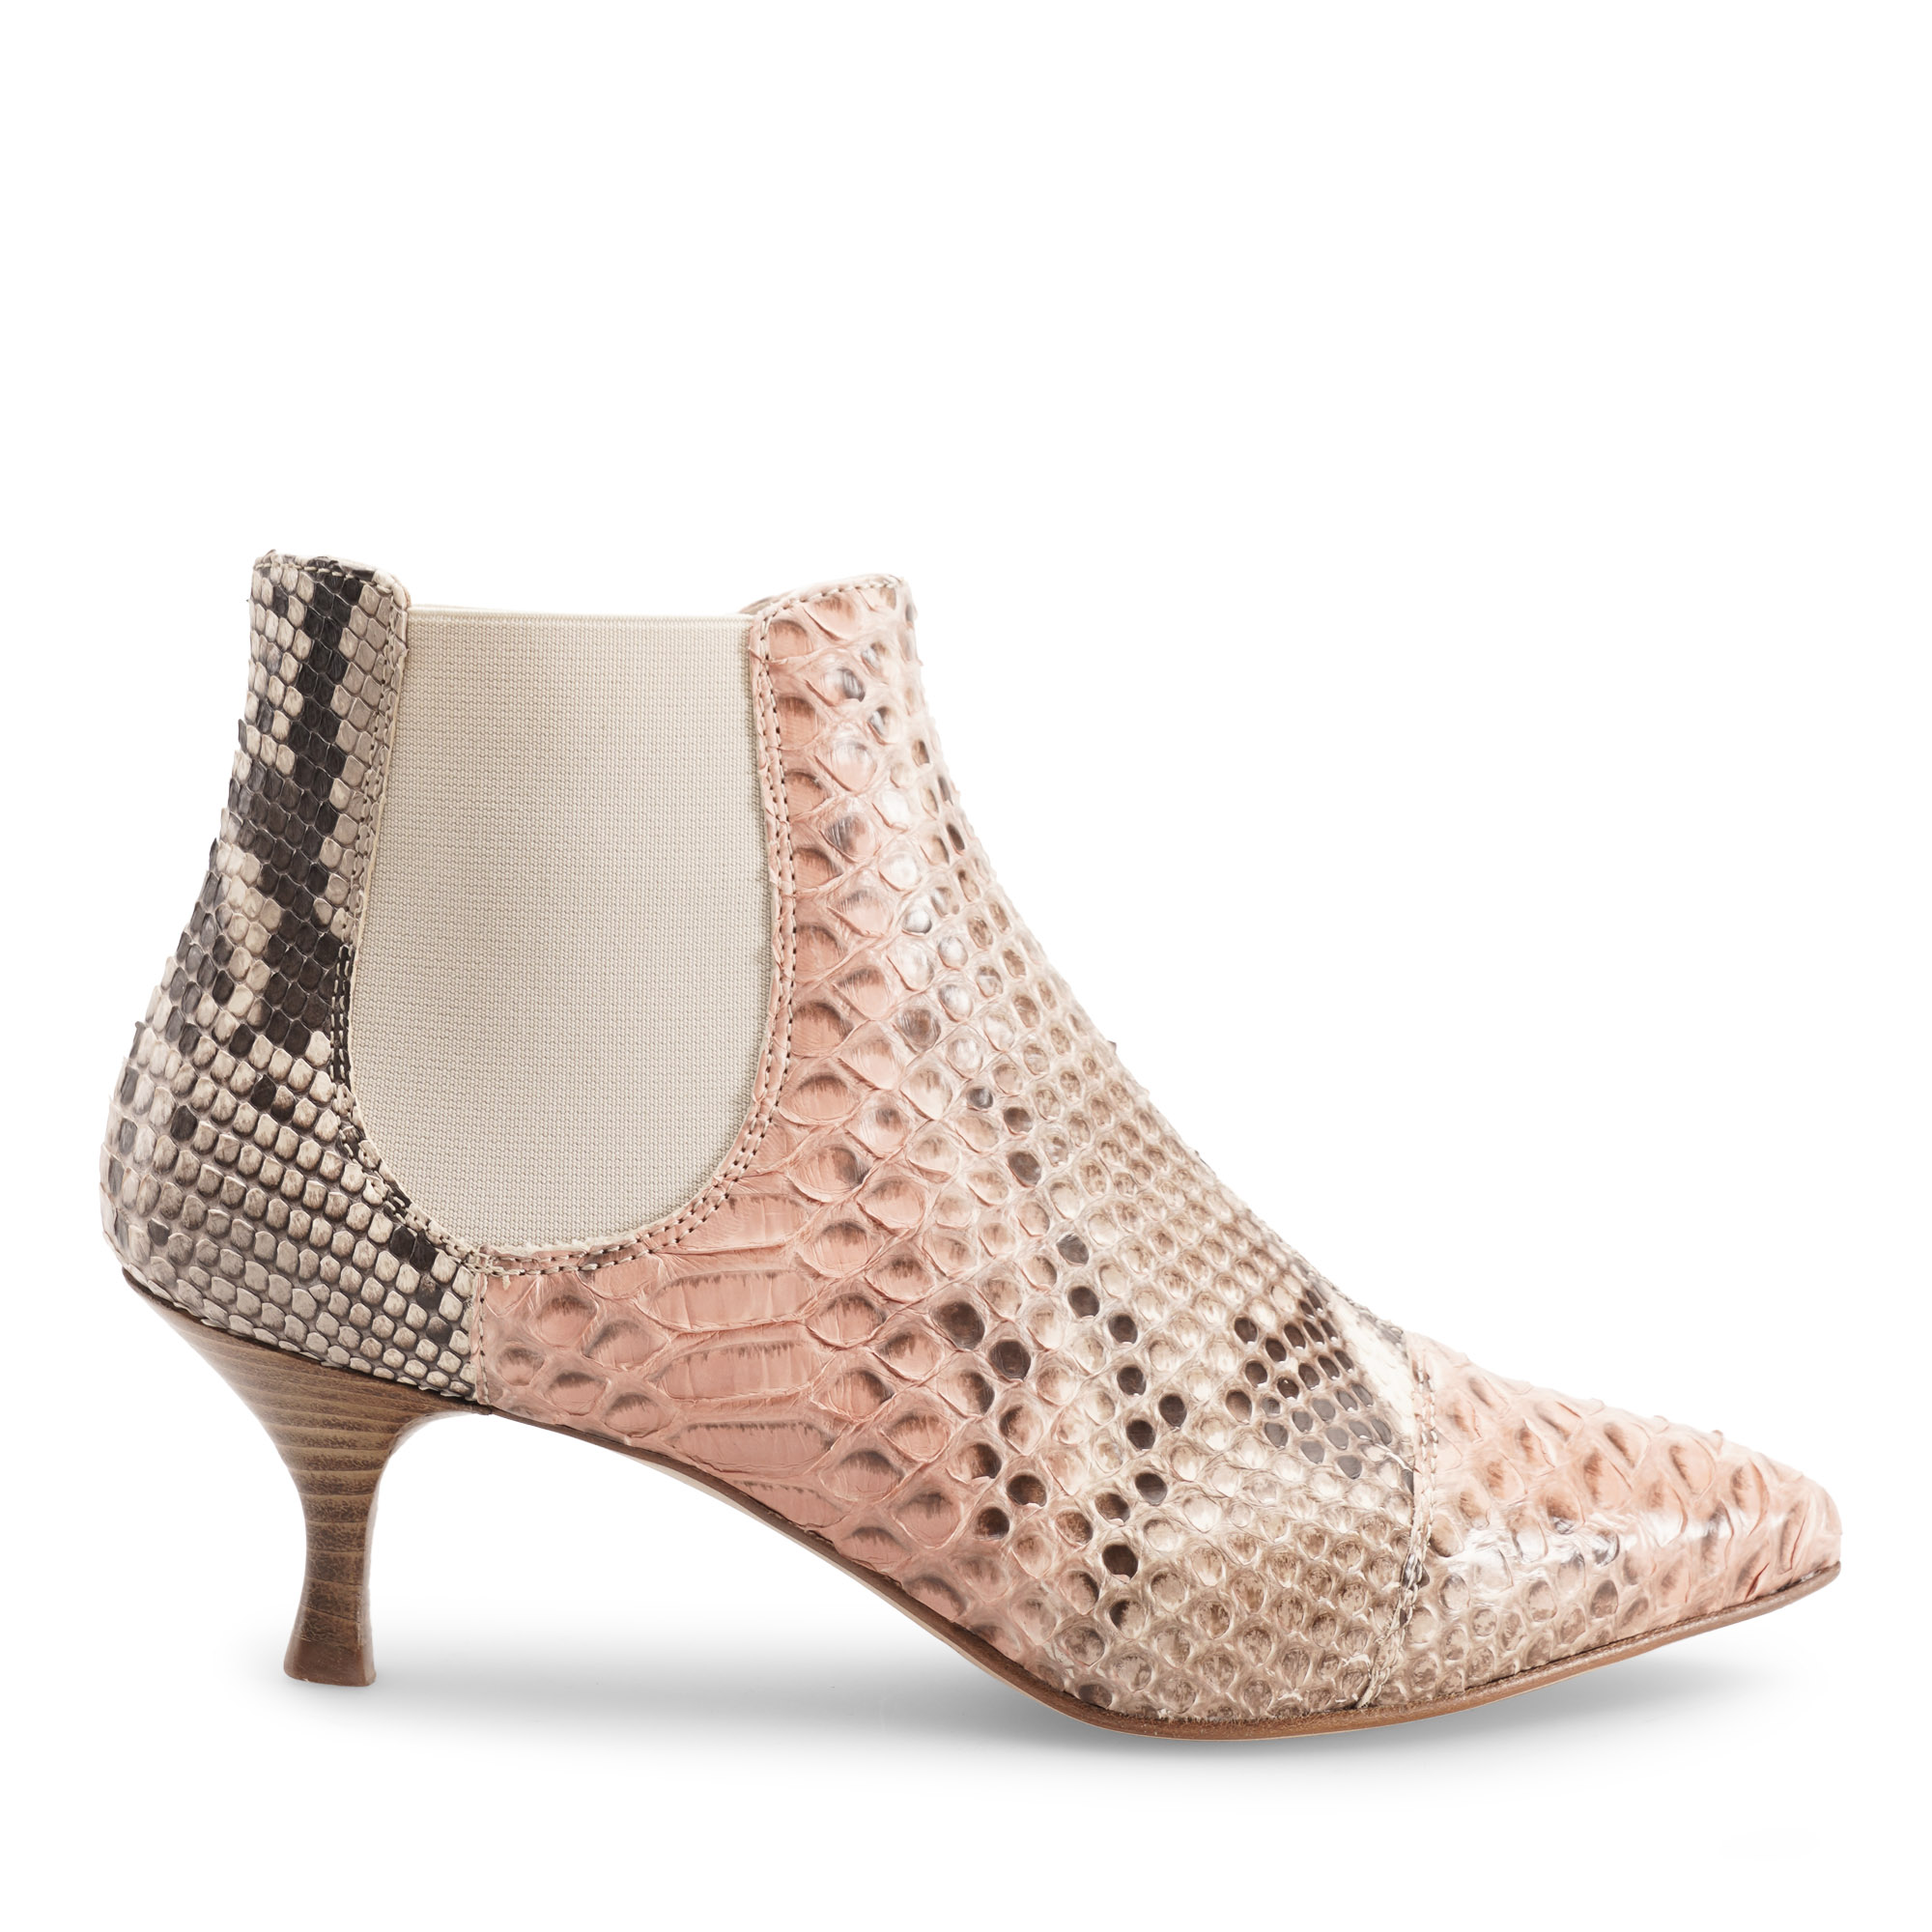 stivaletto-tronchetto-pitone-rosa-emanuela-passeri-shoes-heels-spring-summer-2021